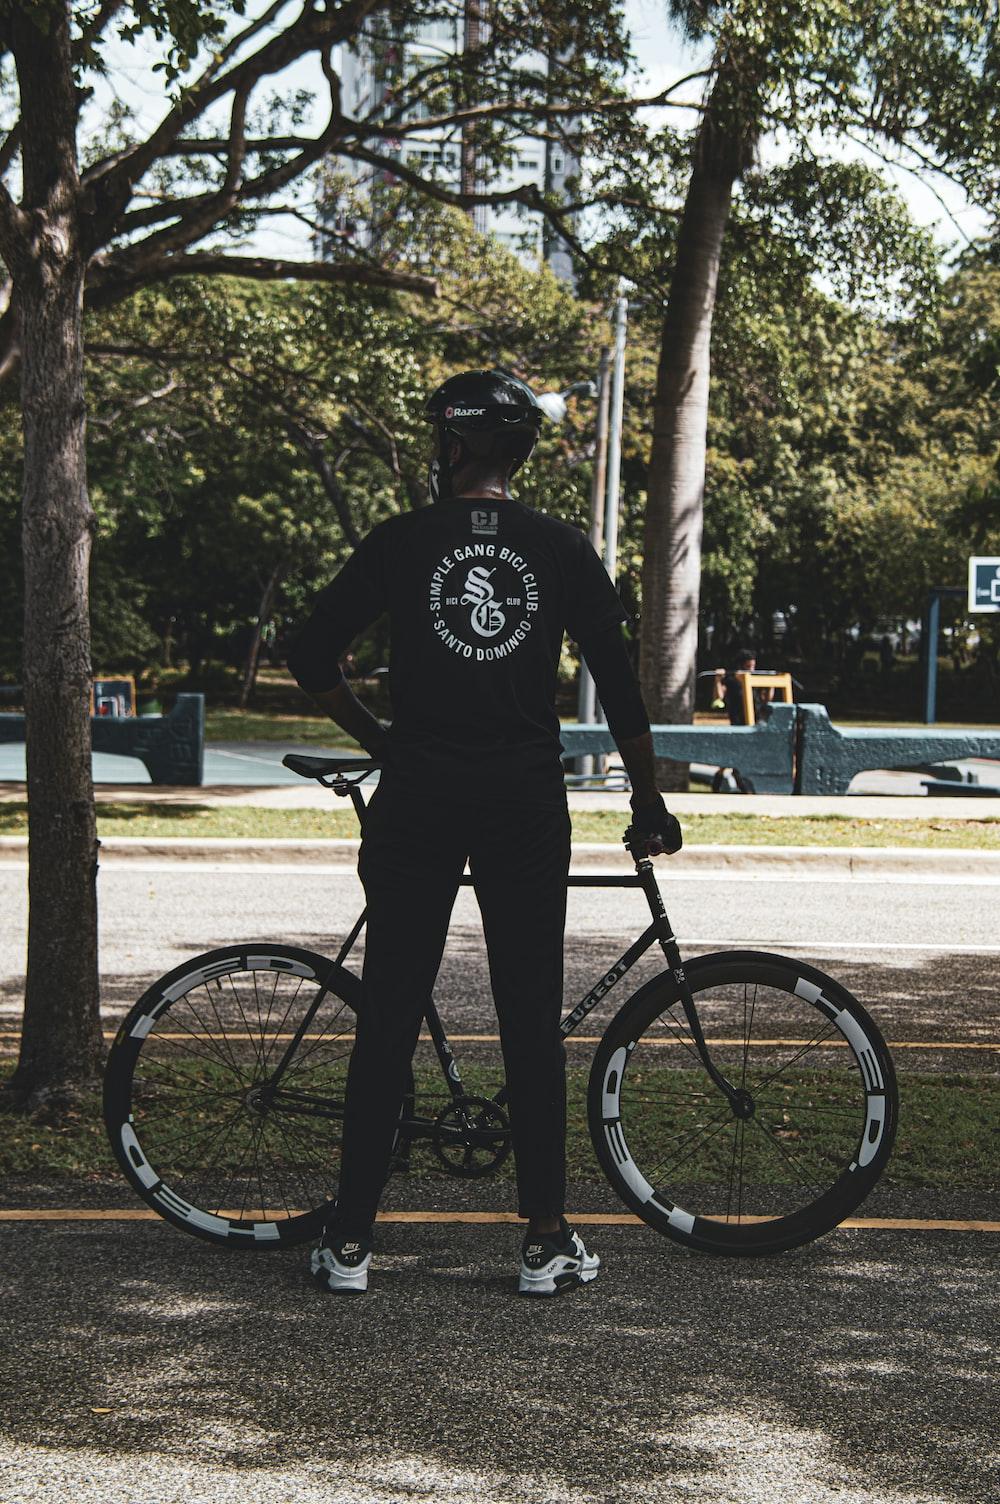 man in black t-shirt and black pants riding bicycle during daytime